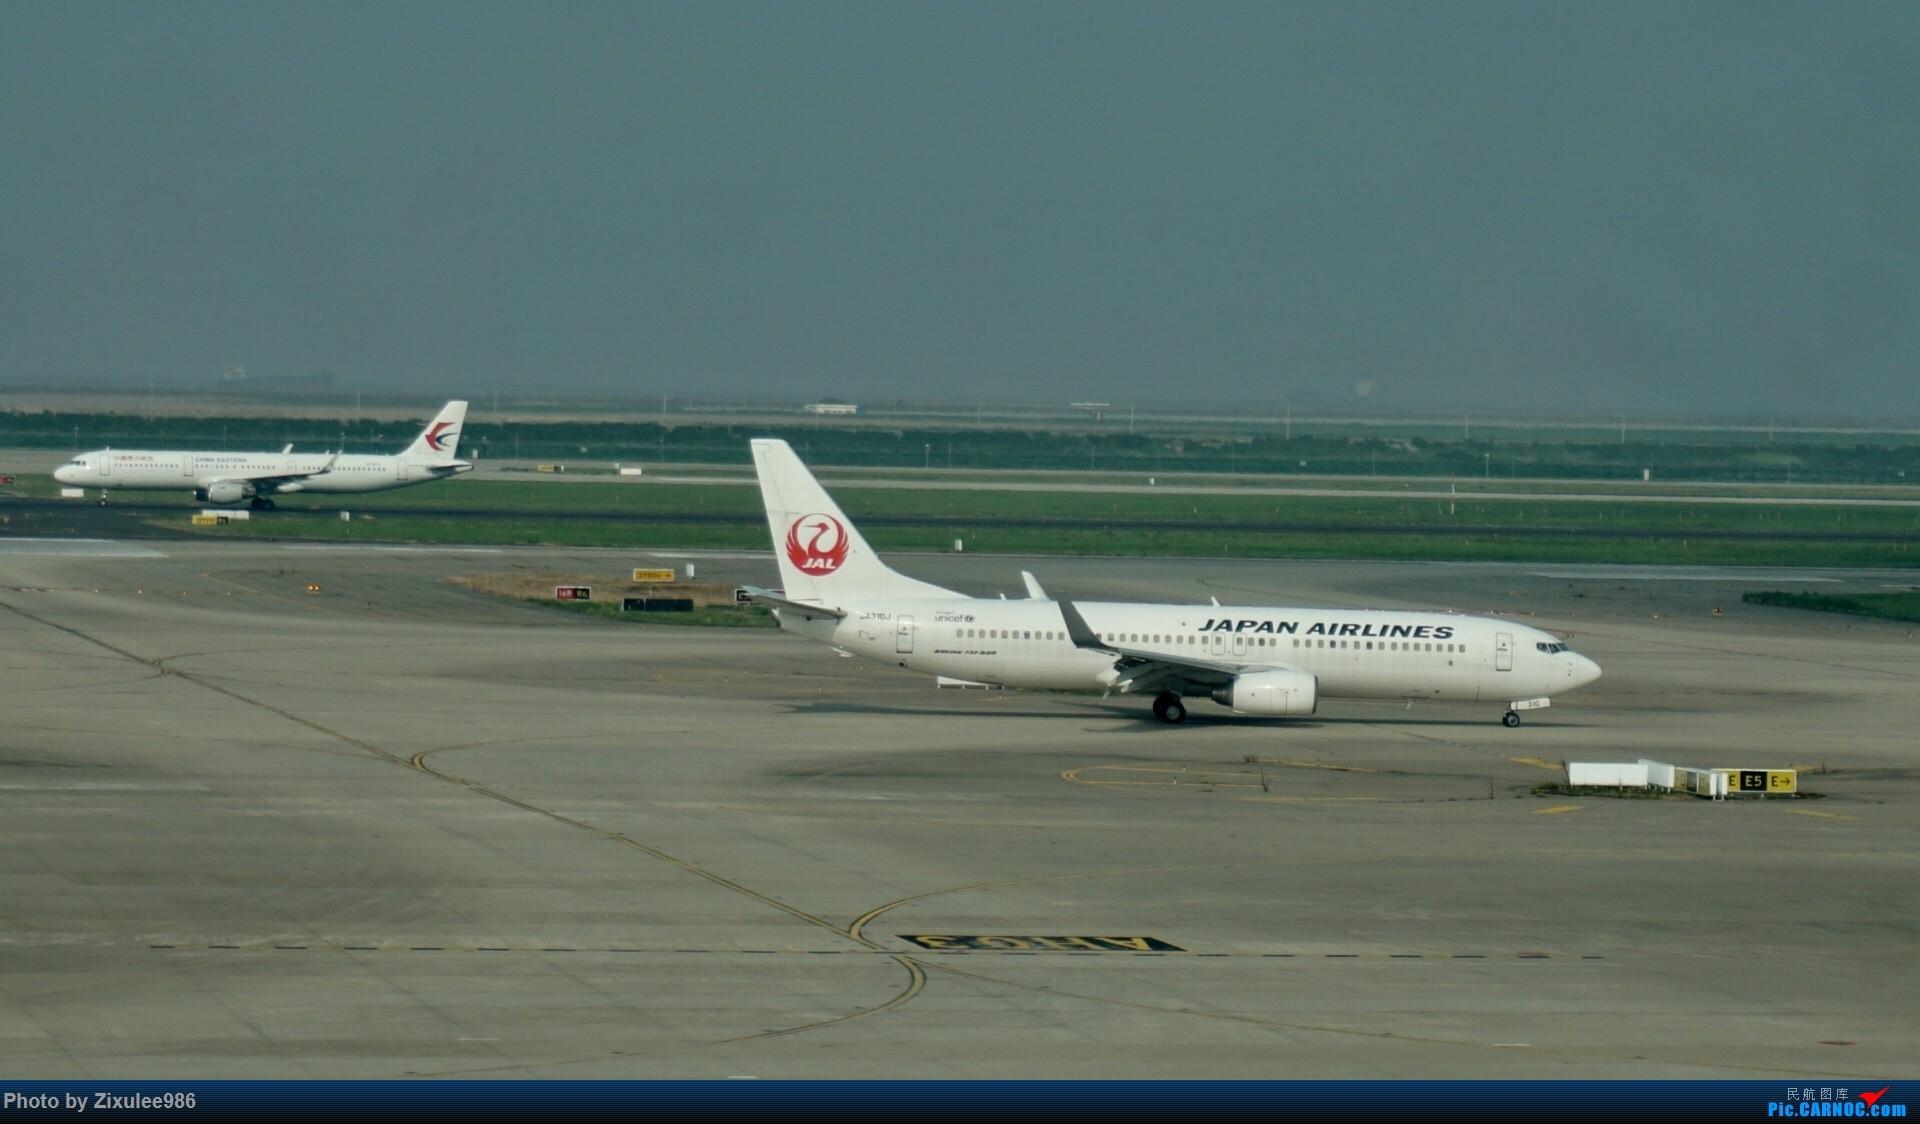 Re:[原创]加拿大21日游学之旅(一)~JJN-PVG-YYZ..(内含flightlog)~第一次发游记~多图缓更请谅解 BOEING 737-800 JA310J 中国上海浦东国际机场